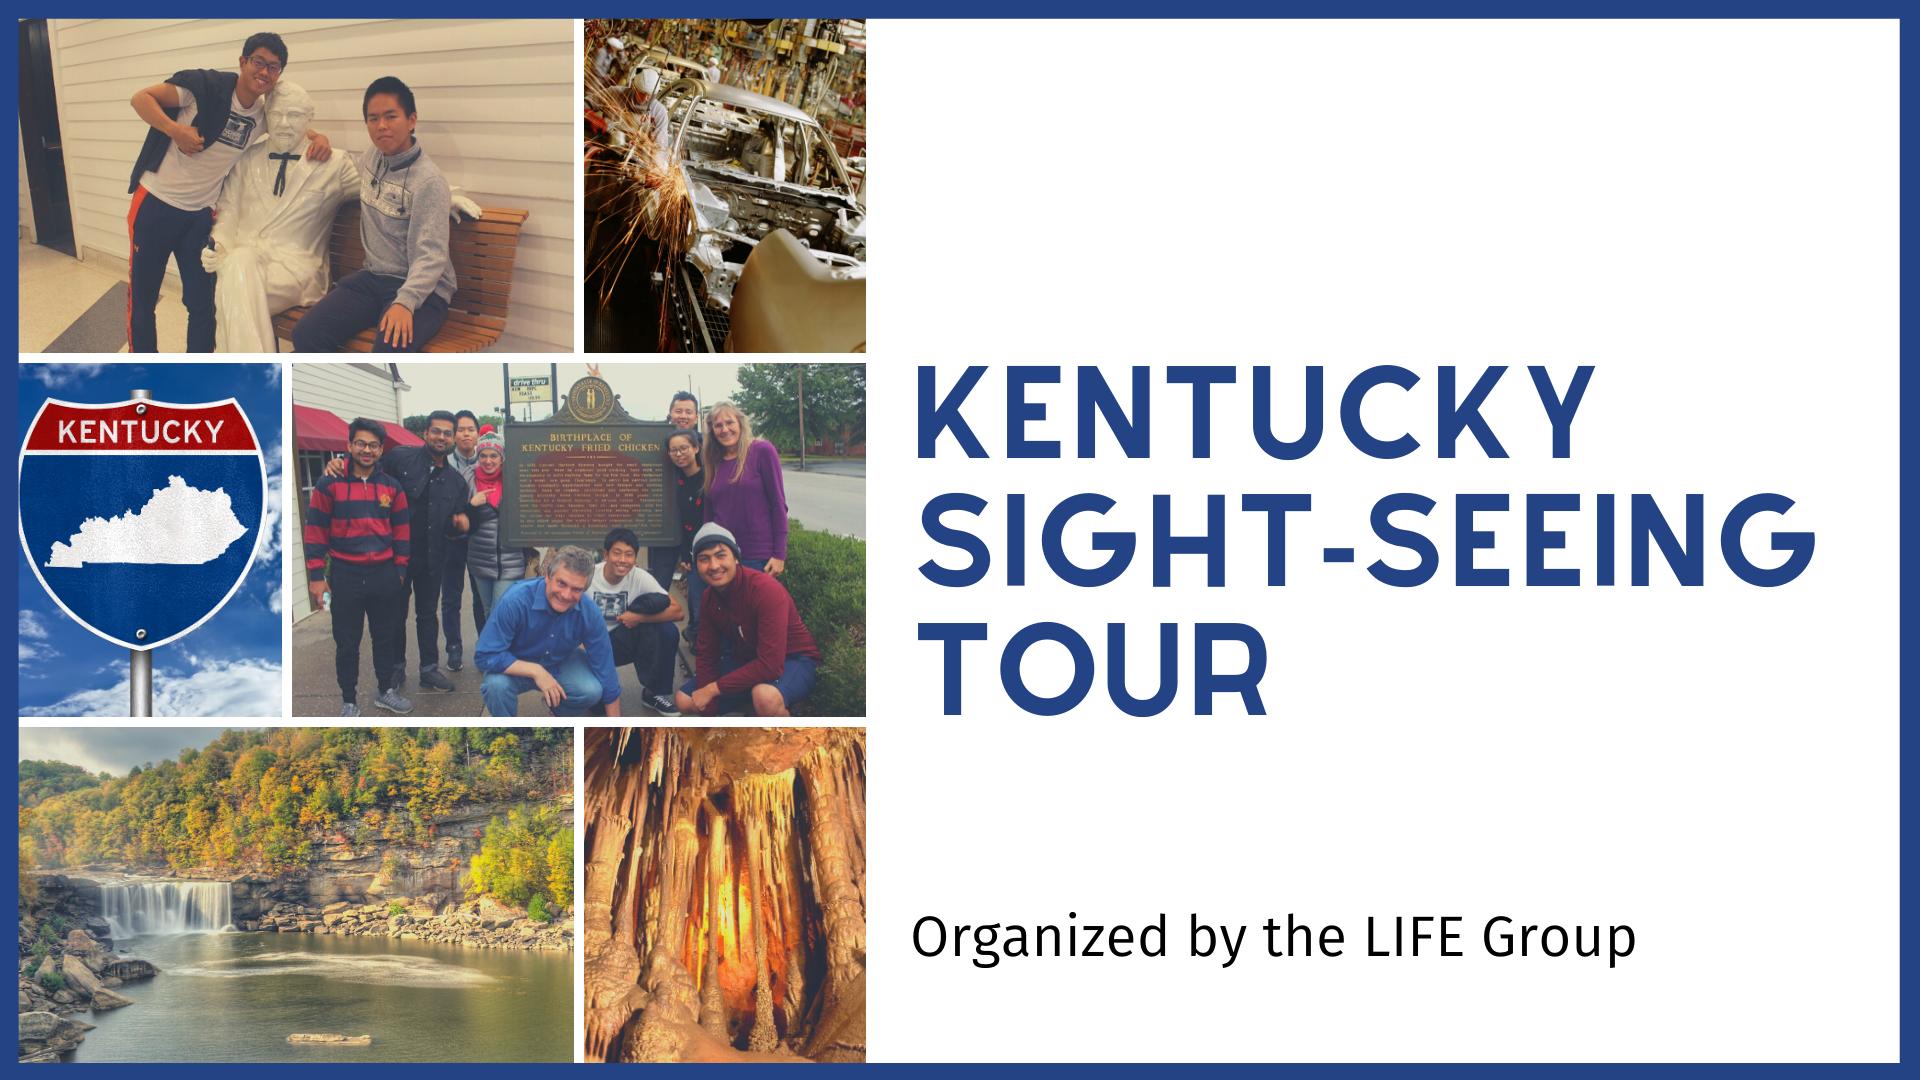 Kentucky Sight-Seeing Tour